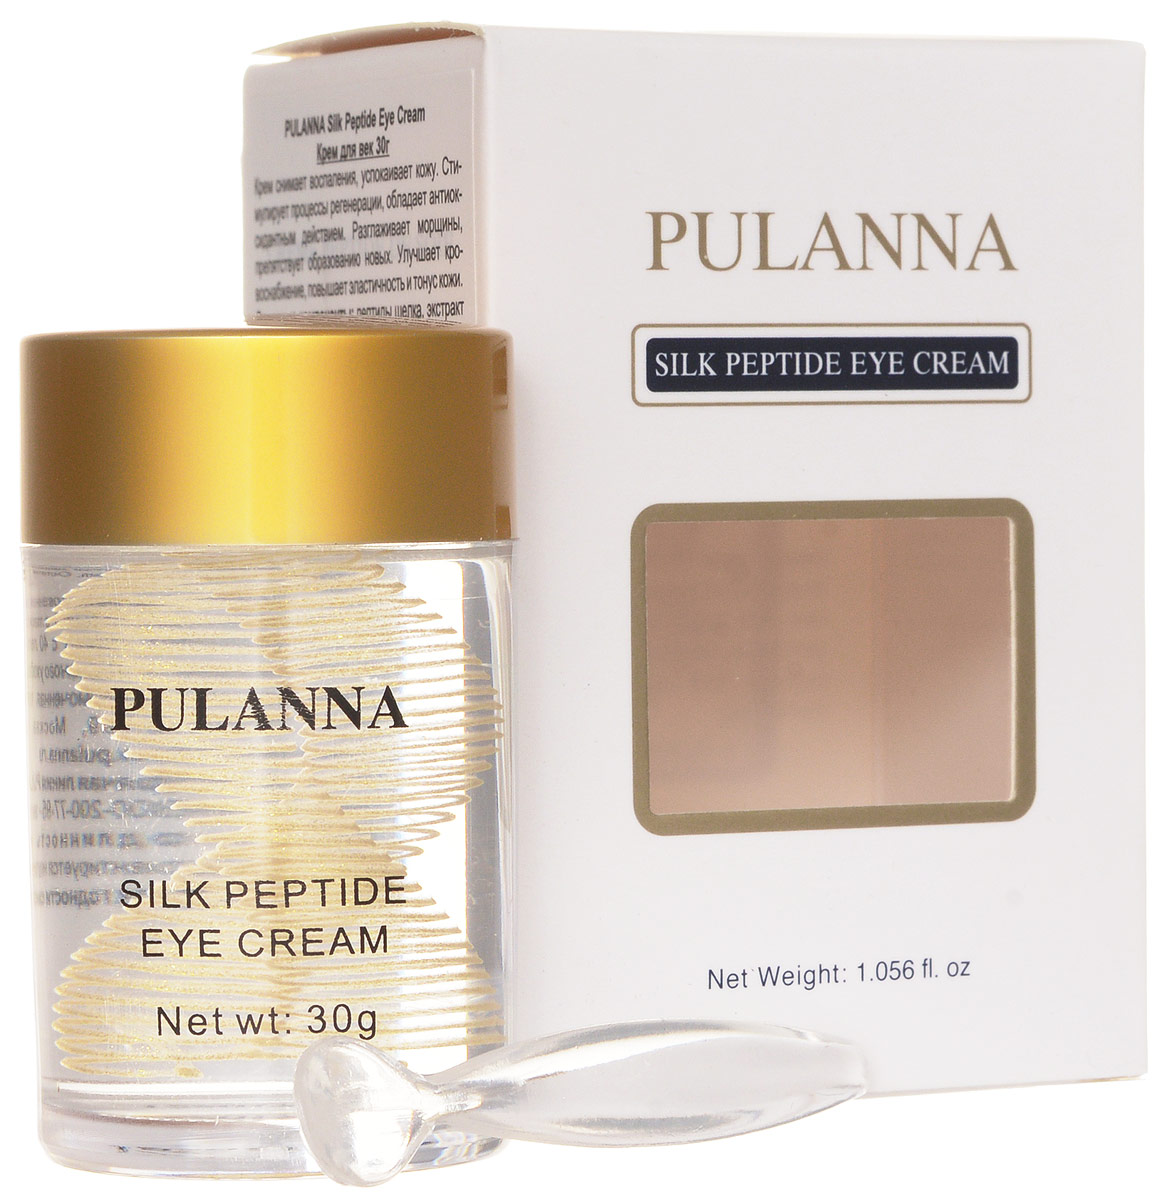 Pulanna Крем для век на основе пептидов шелка - Silk Peptide Eye Cream 30 г